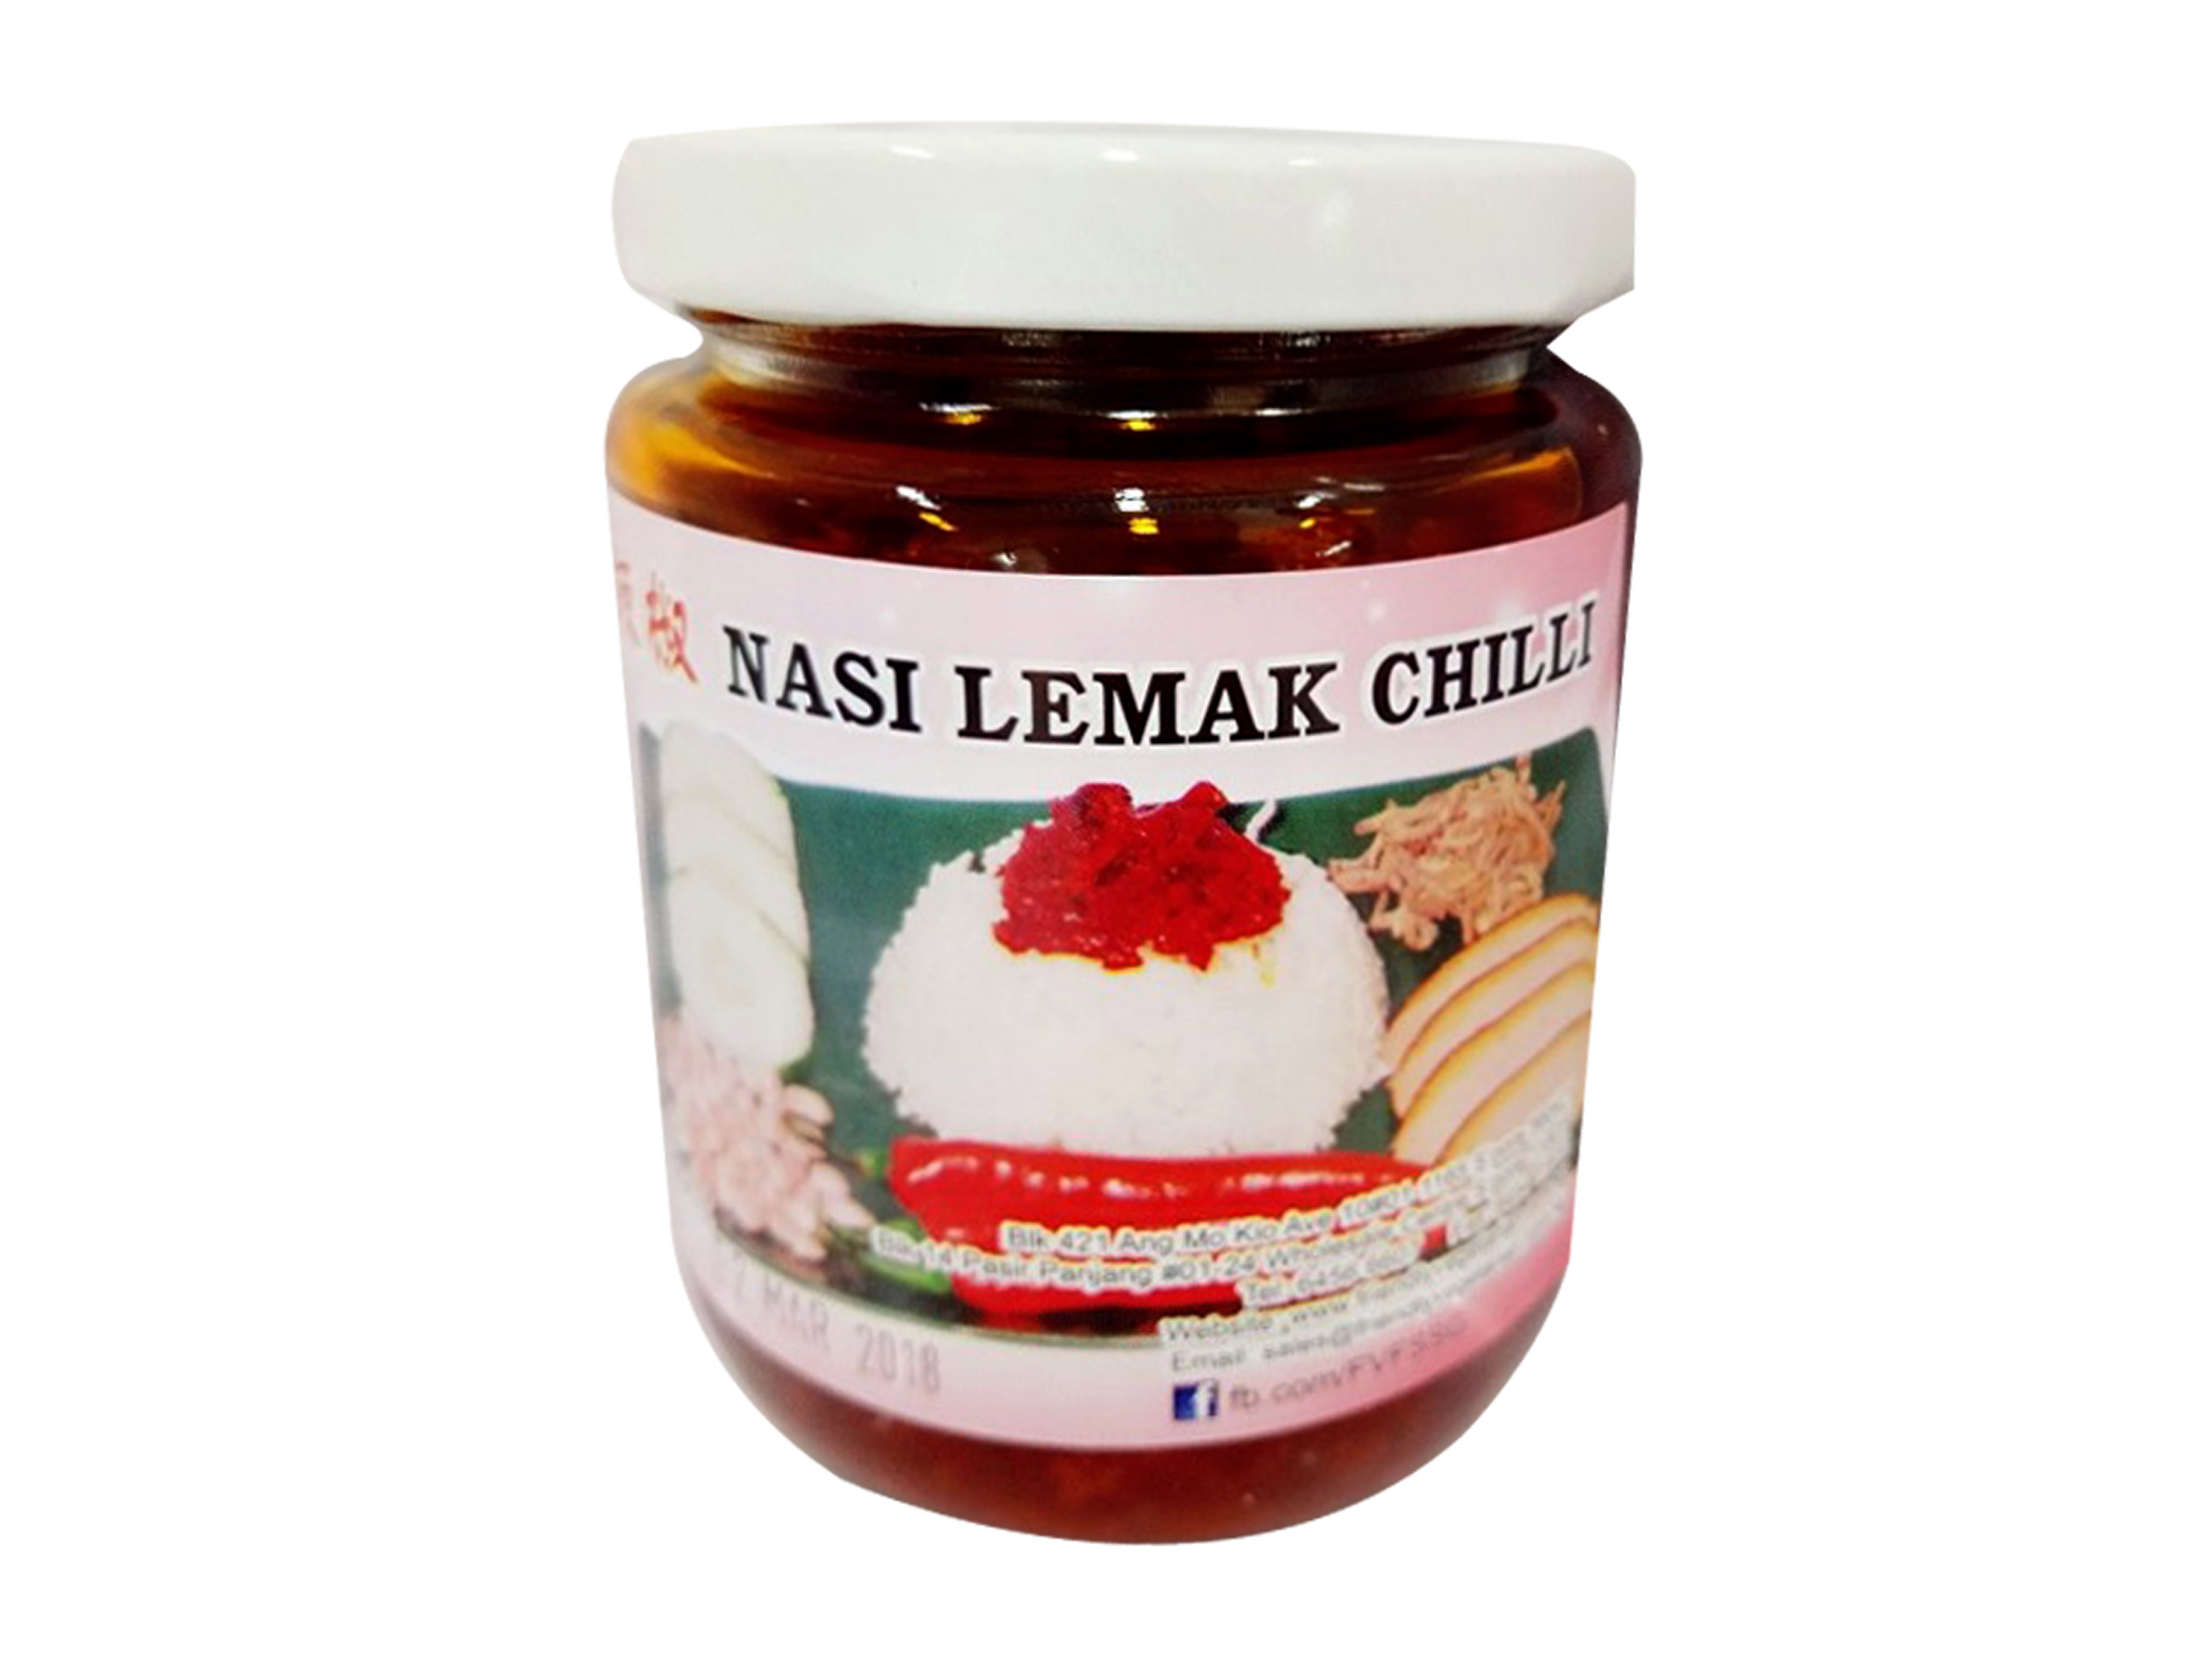 Image Nasi Lemak Chilies 善缘 - 椰浆饭辣椒  250grams